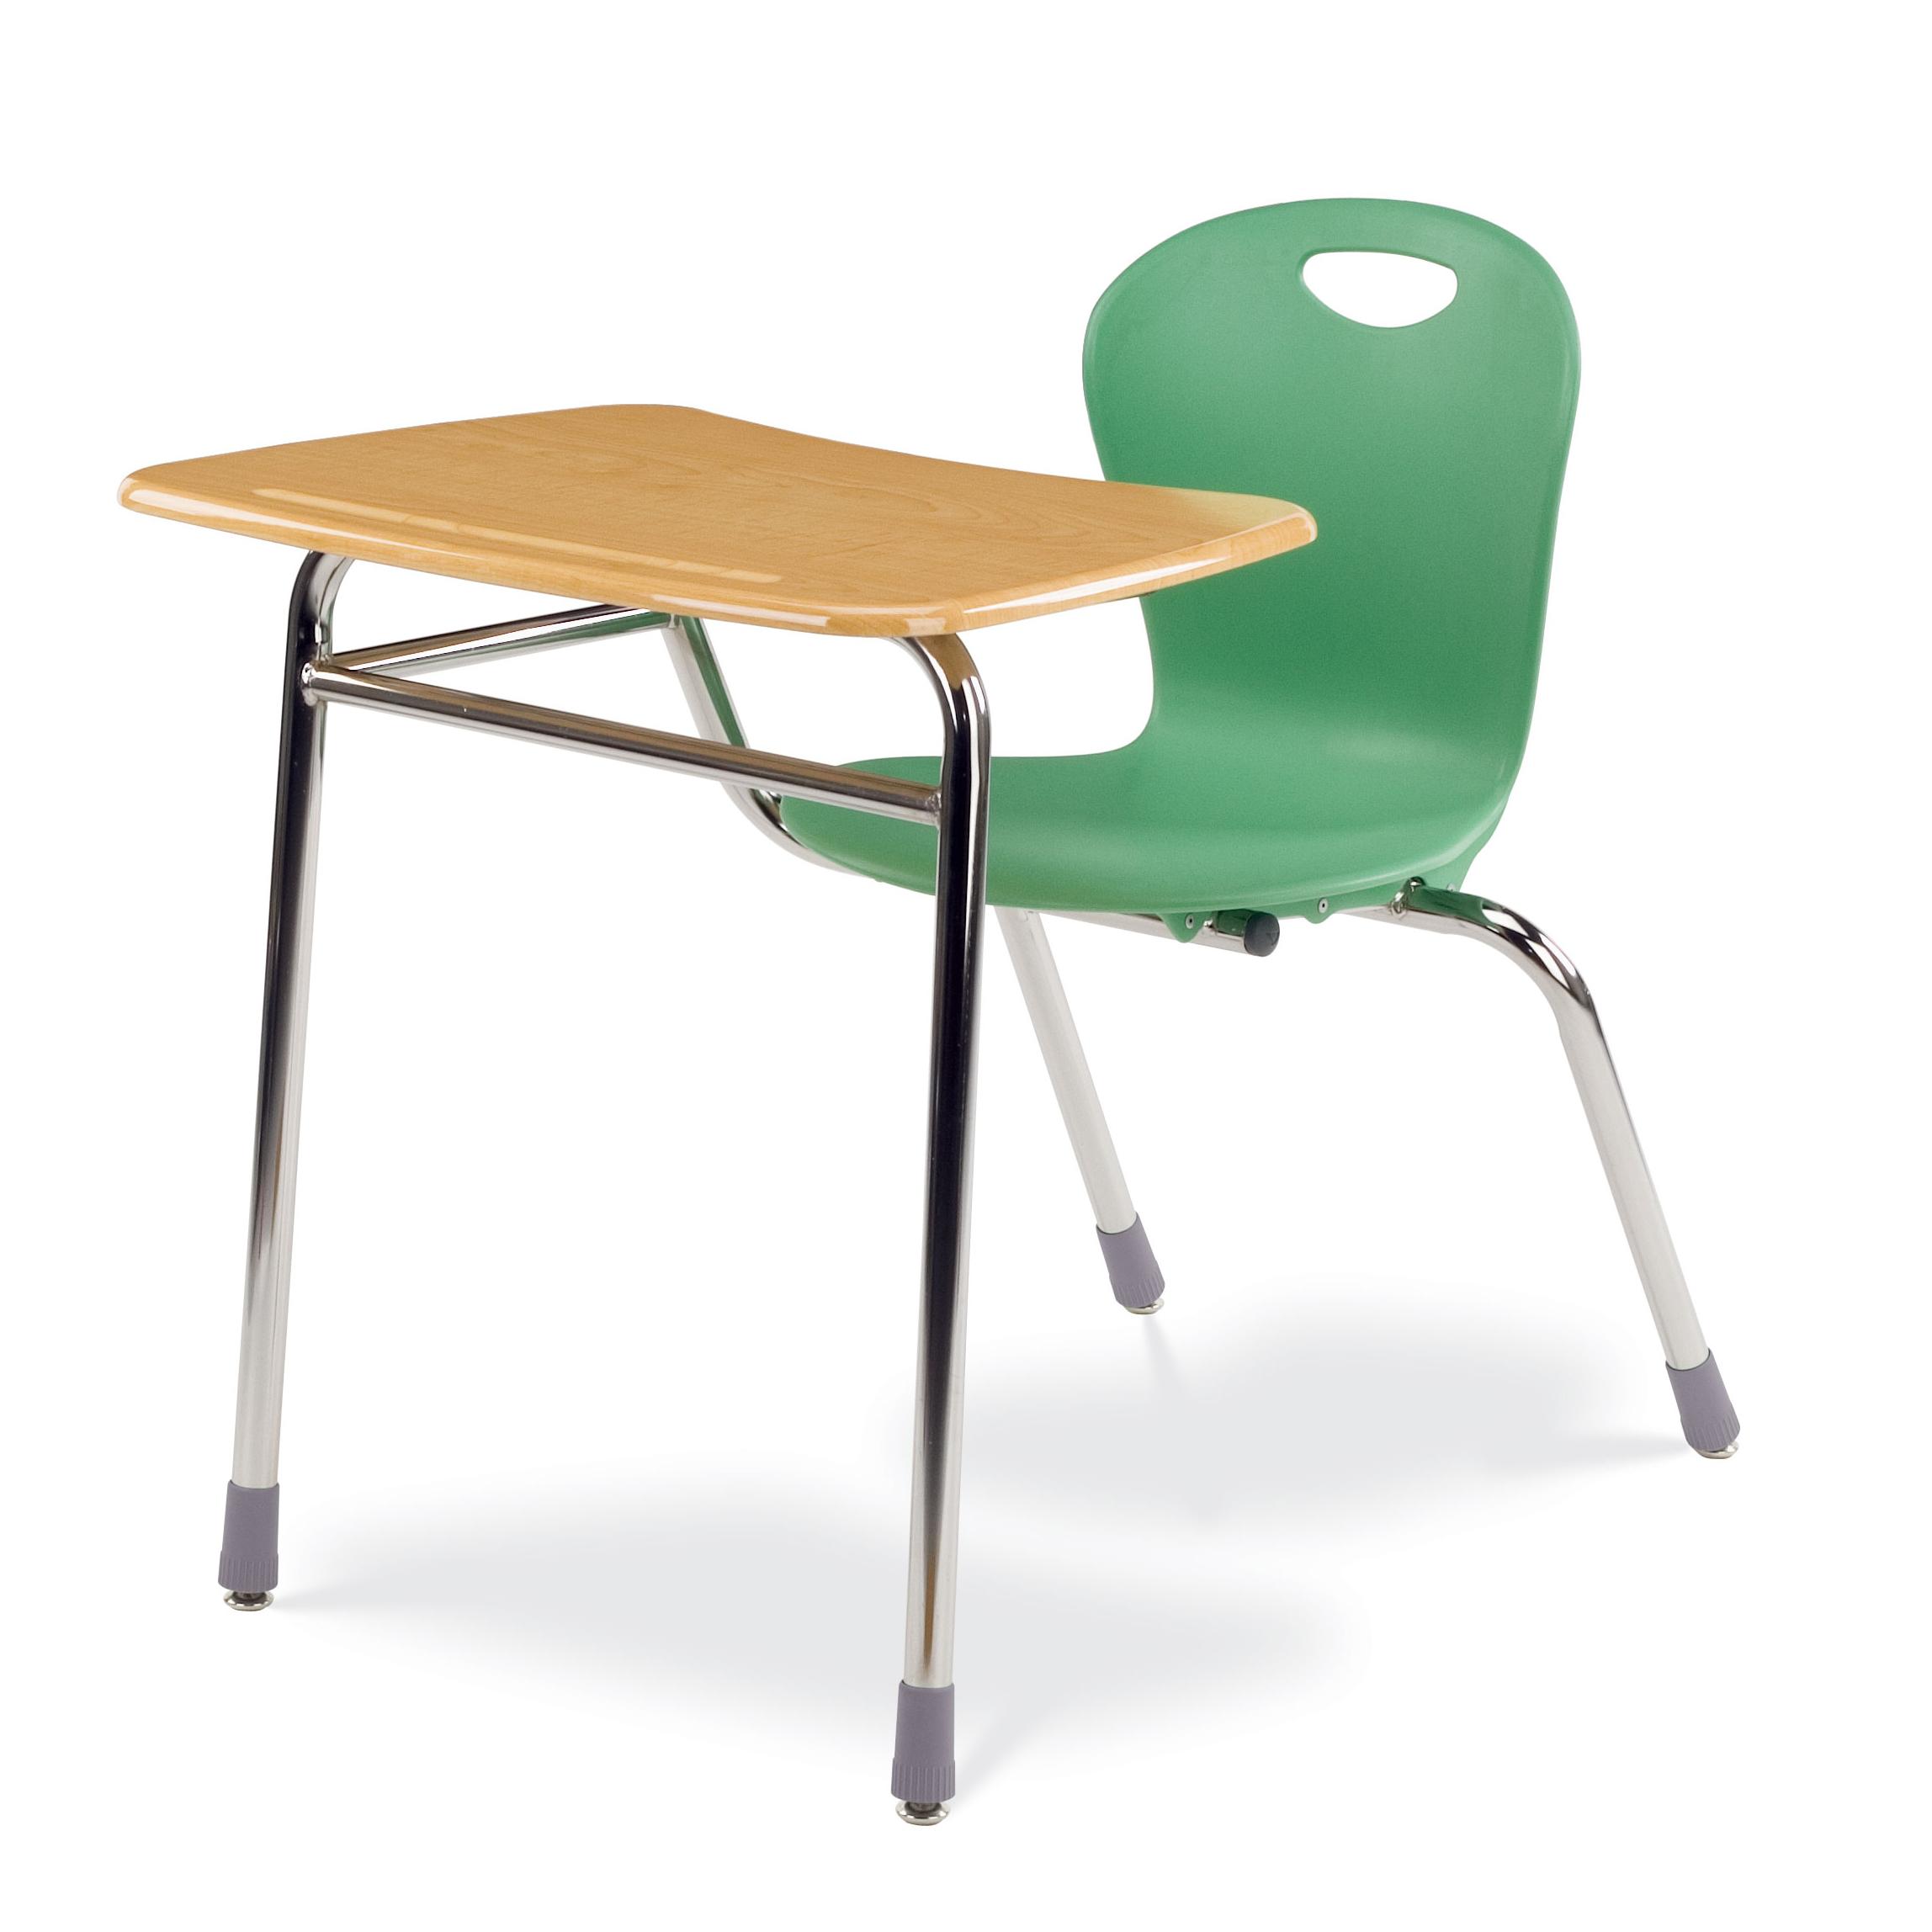 Furniture clipart student desk Chair  Rocking #7524 Kids